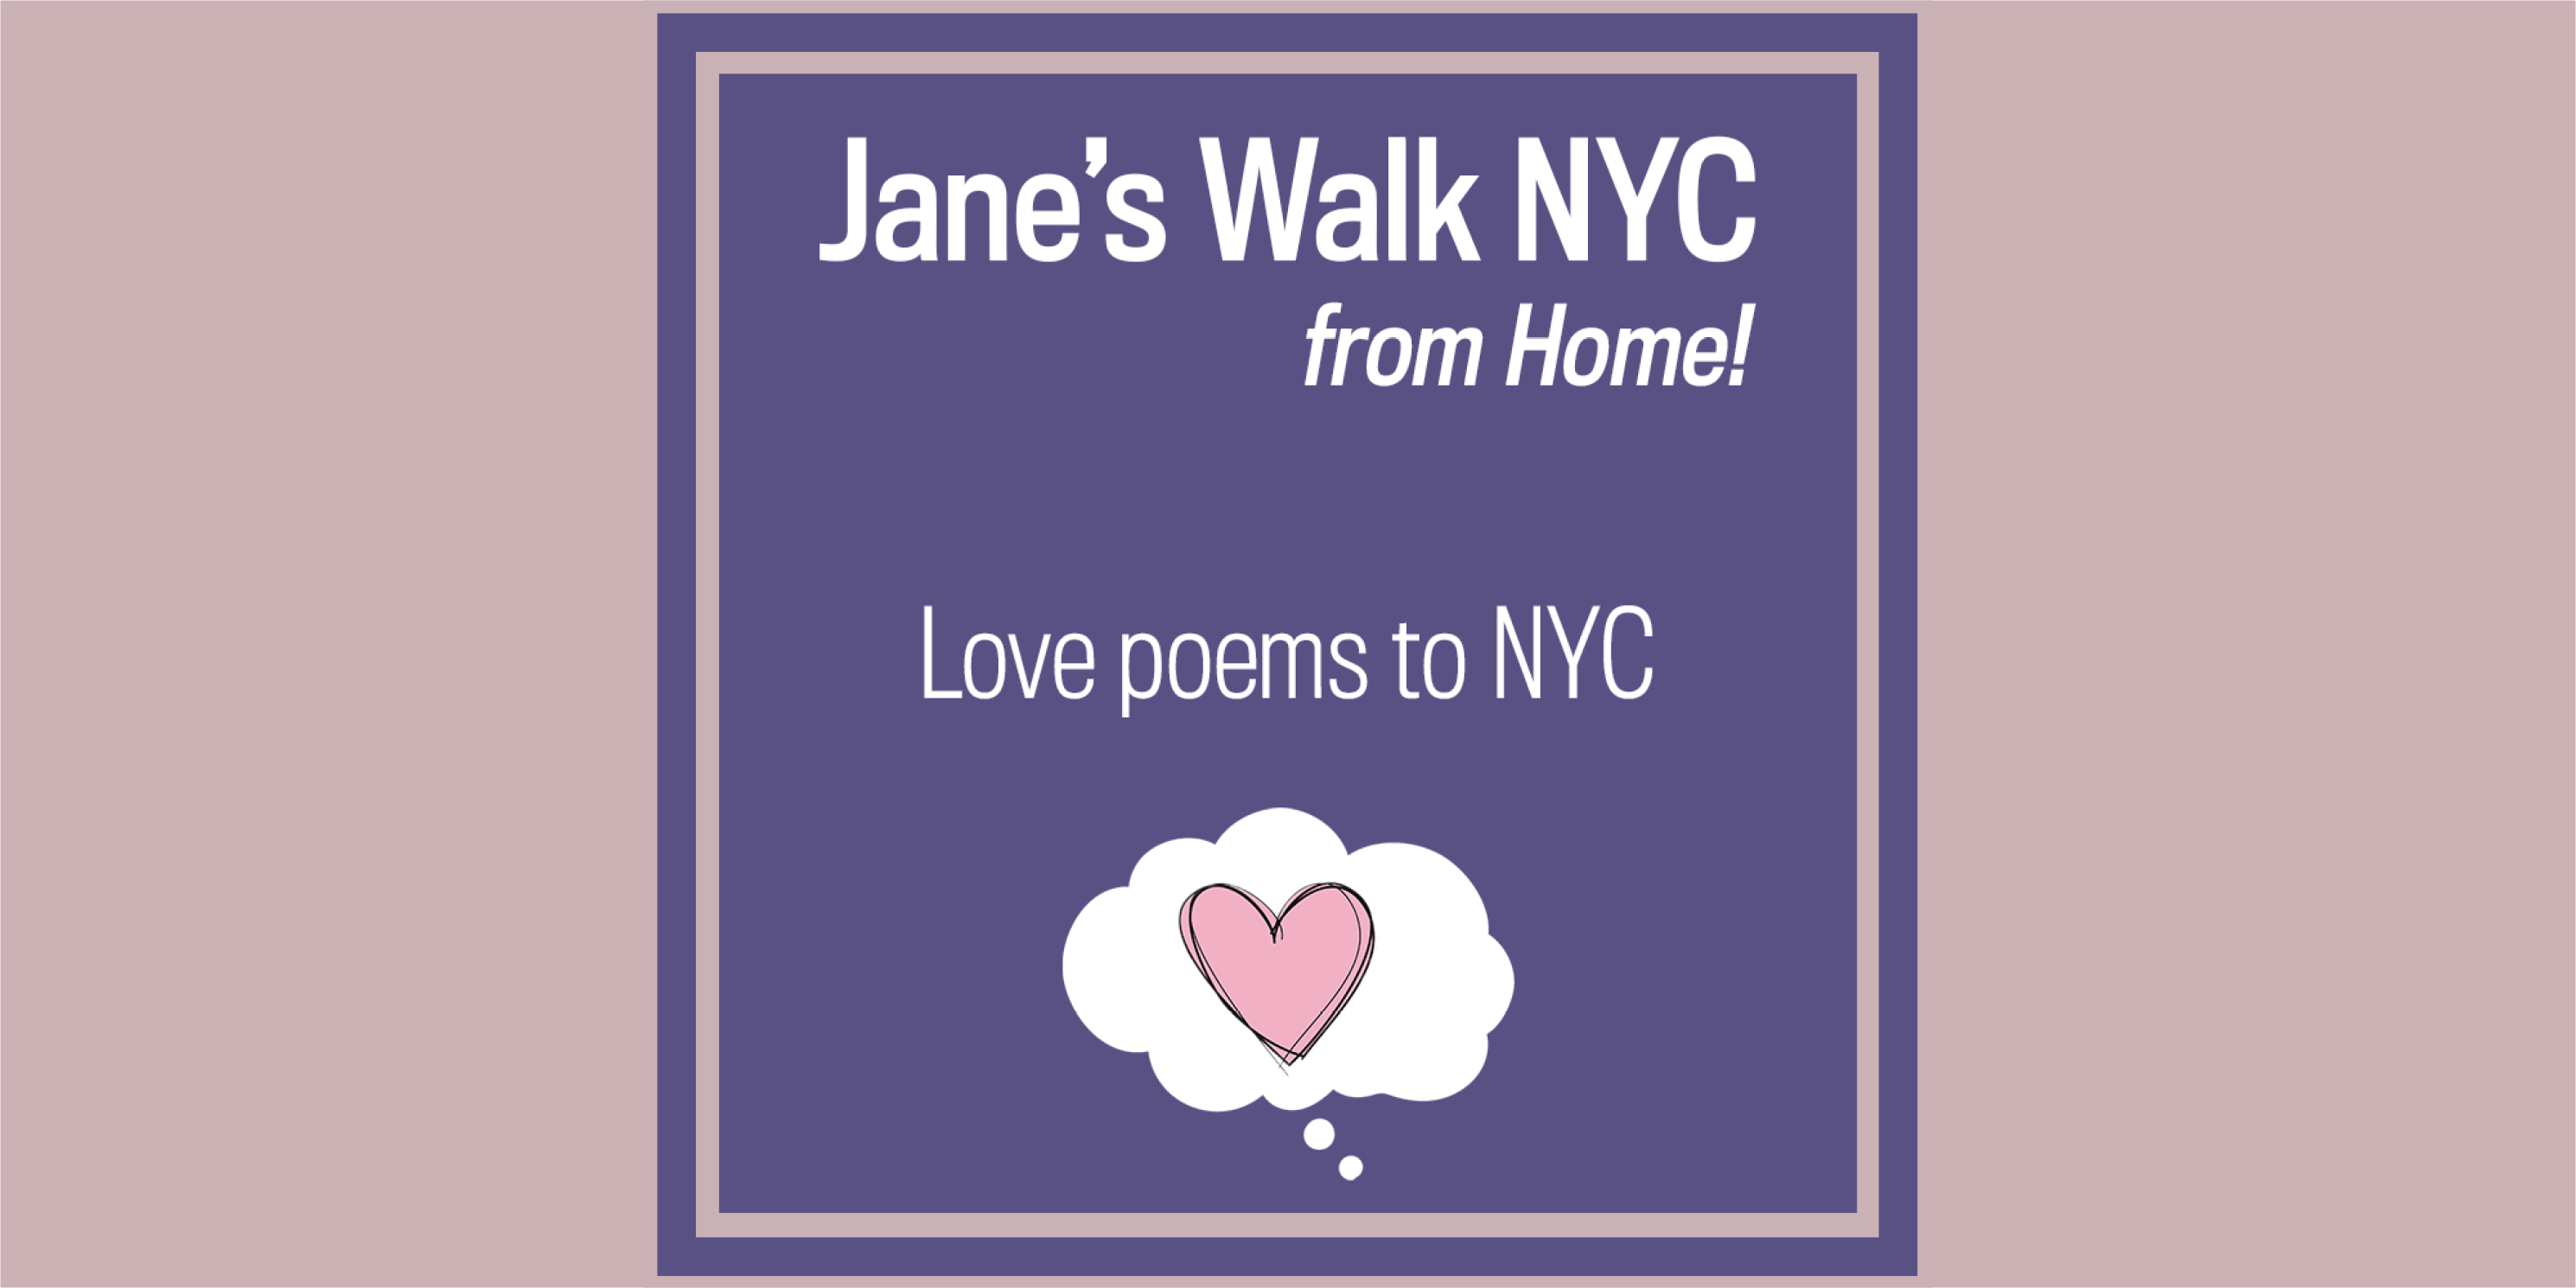 Advertisement for Jane's Walk 2020, Day 4 activities